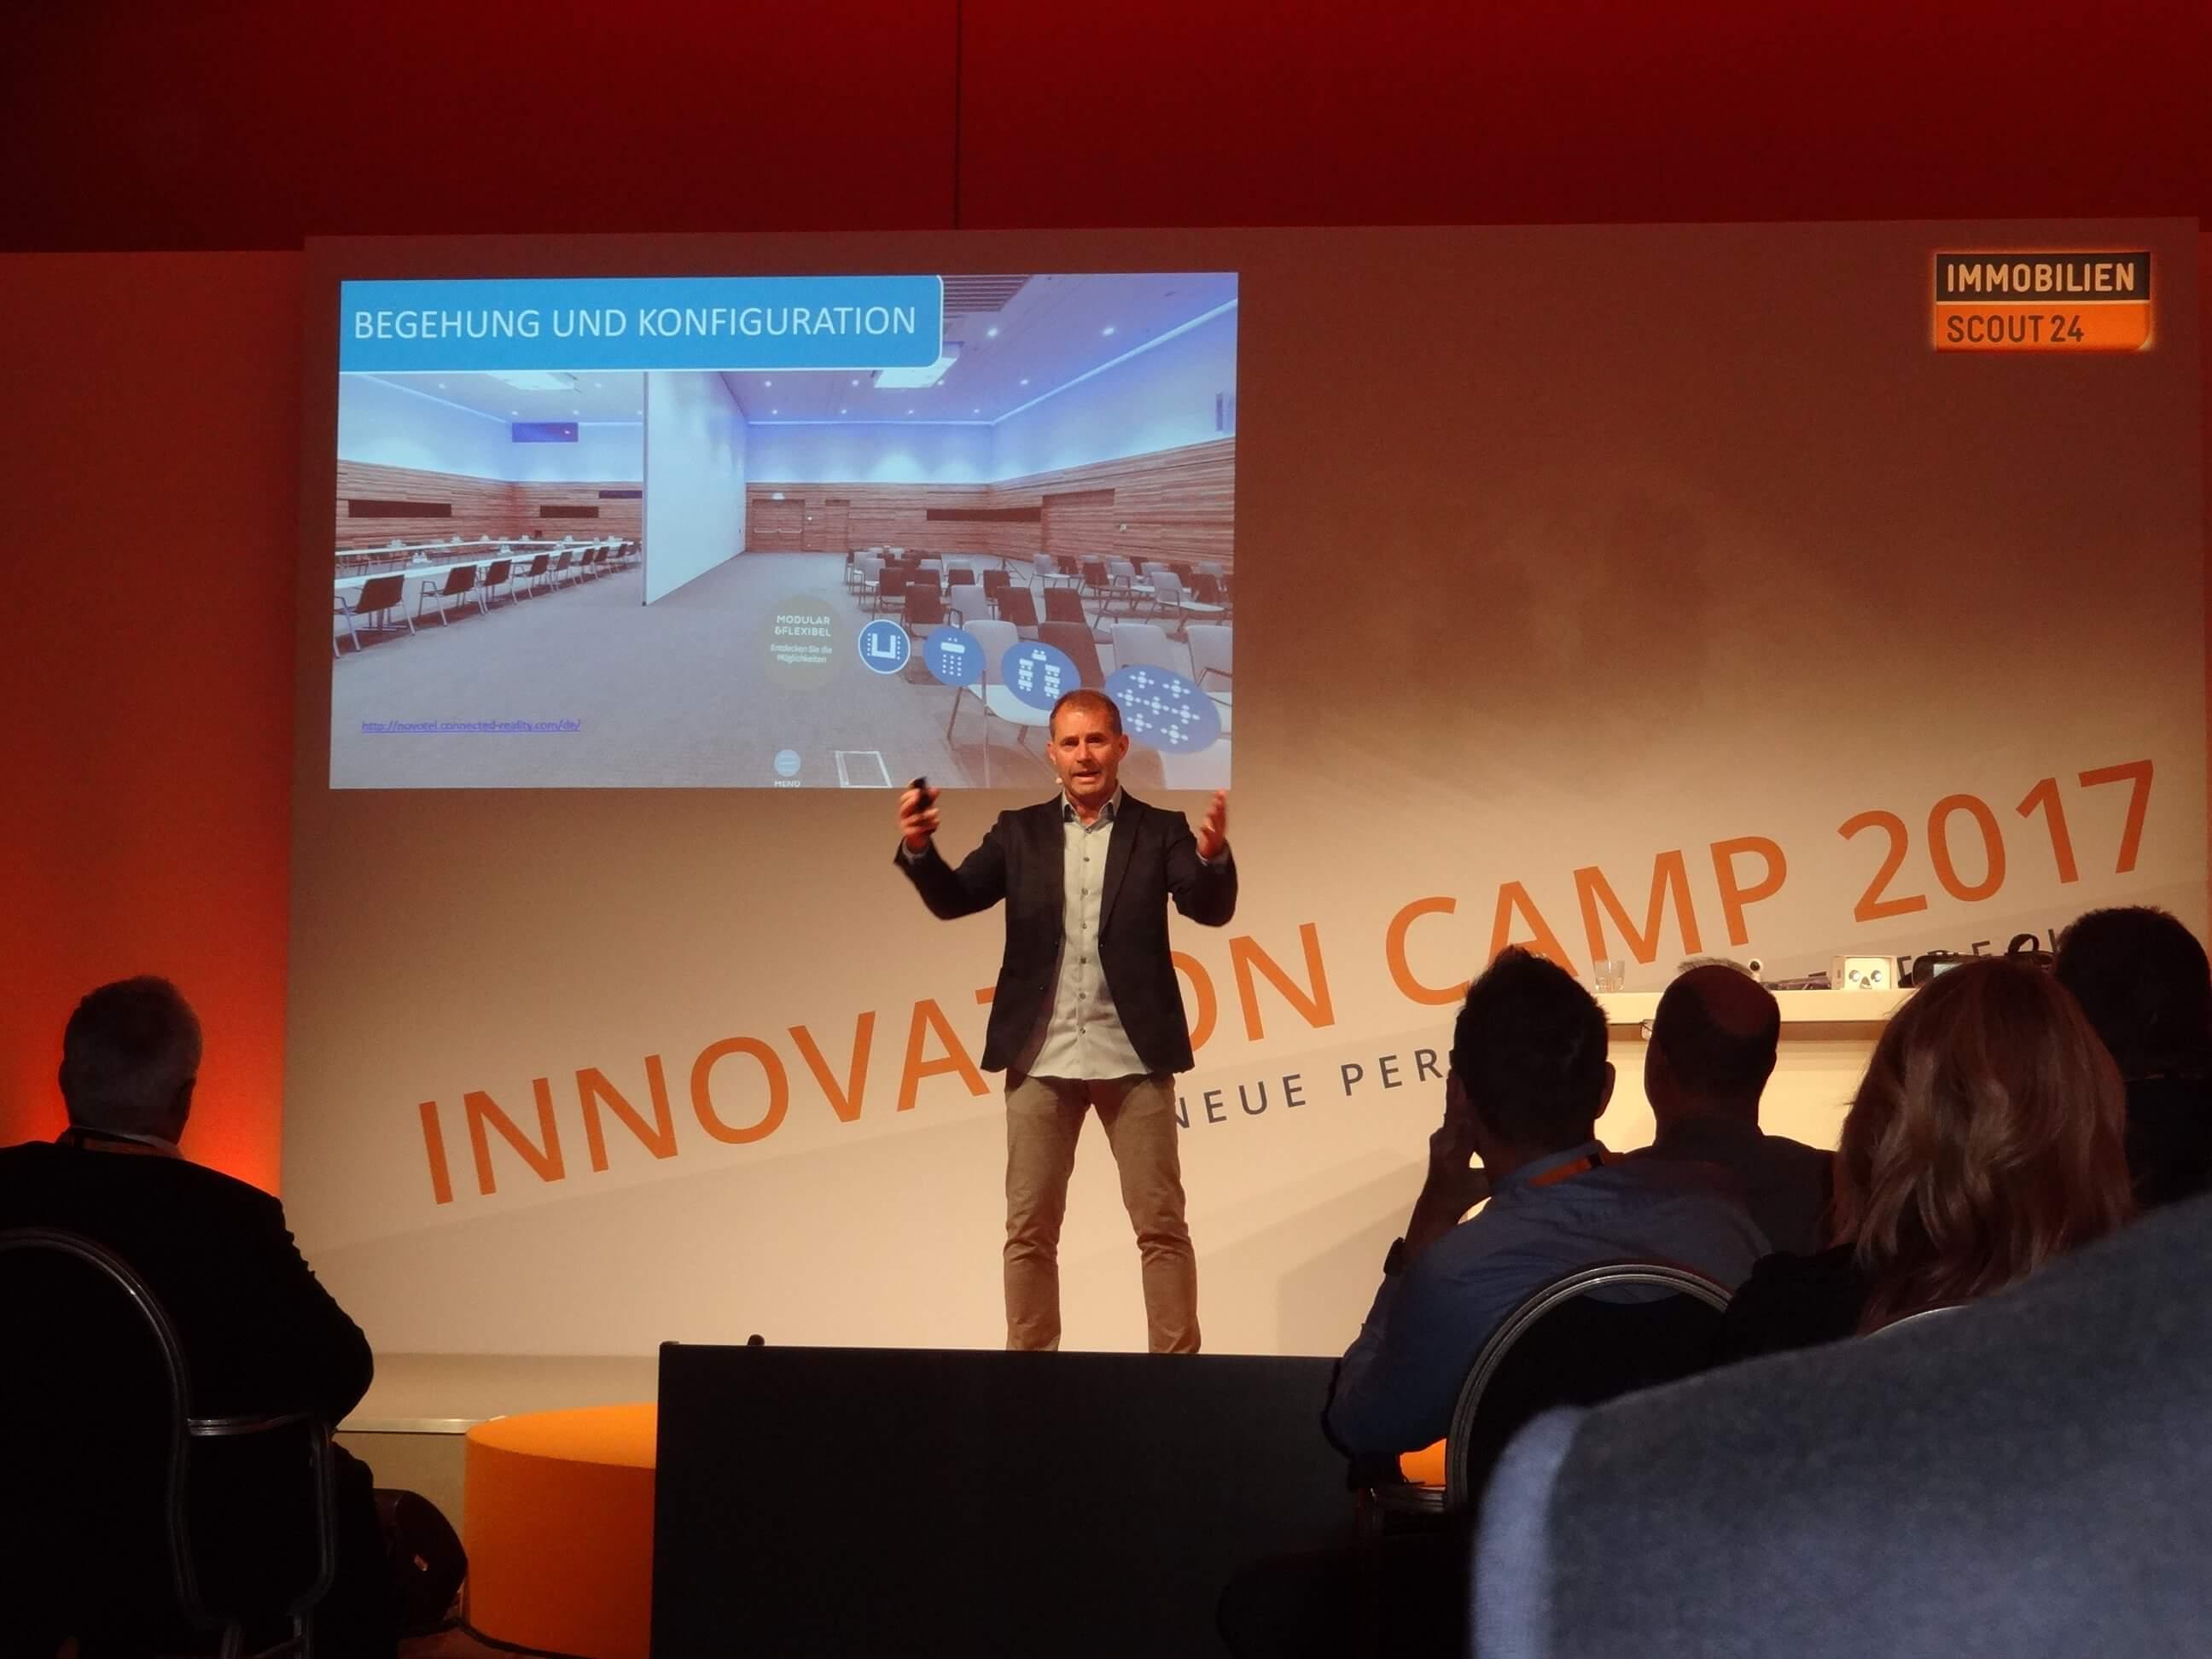 Innovation Camp 2017